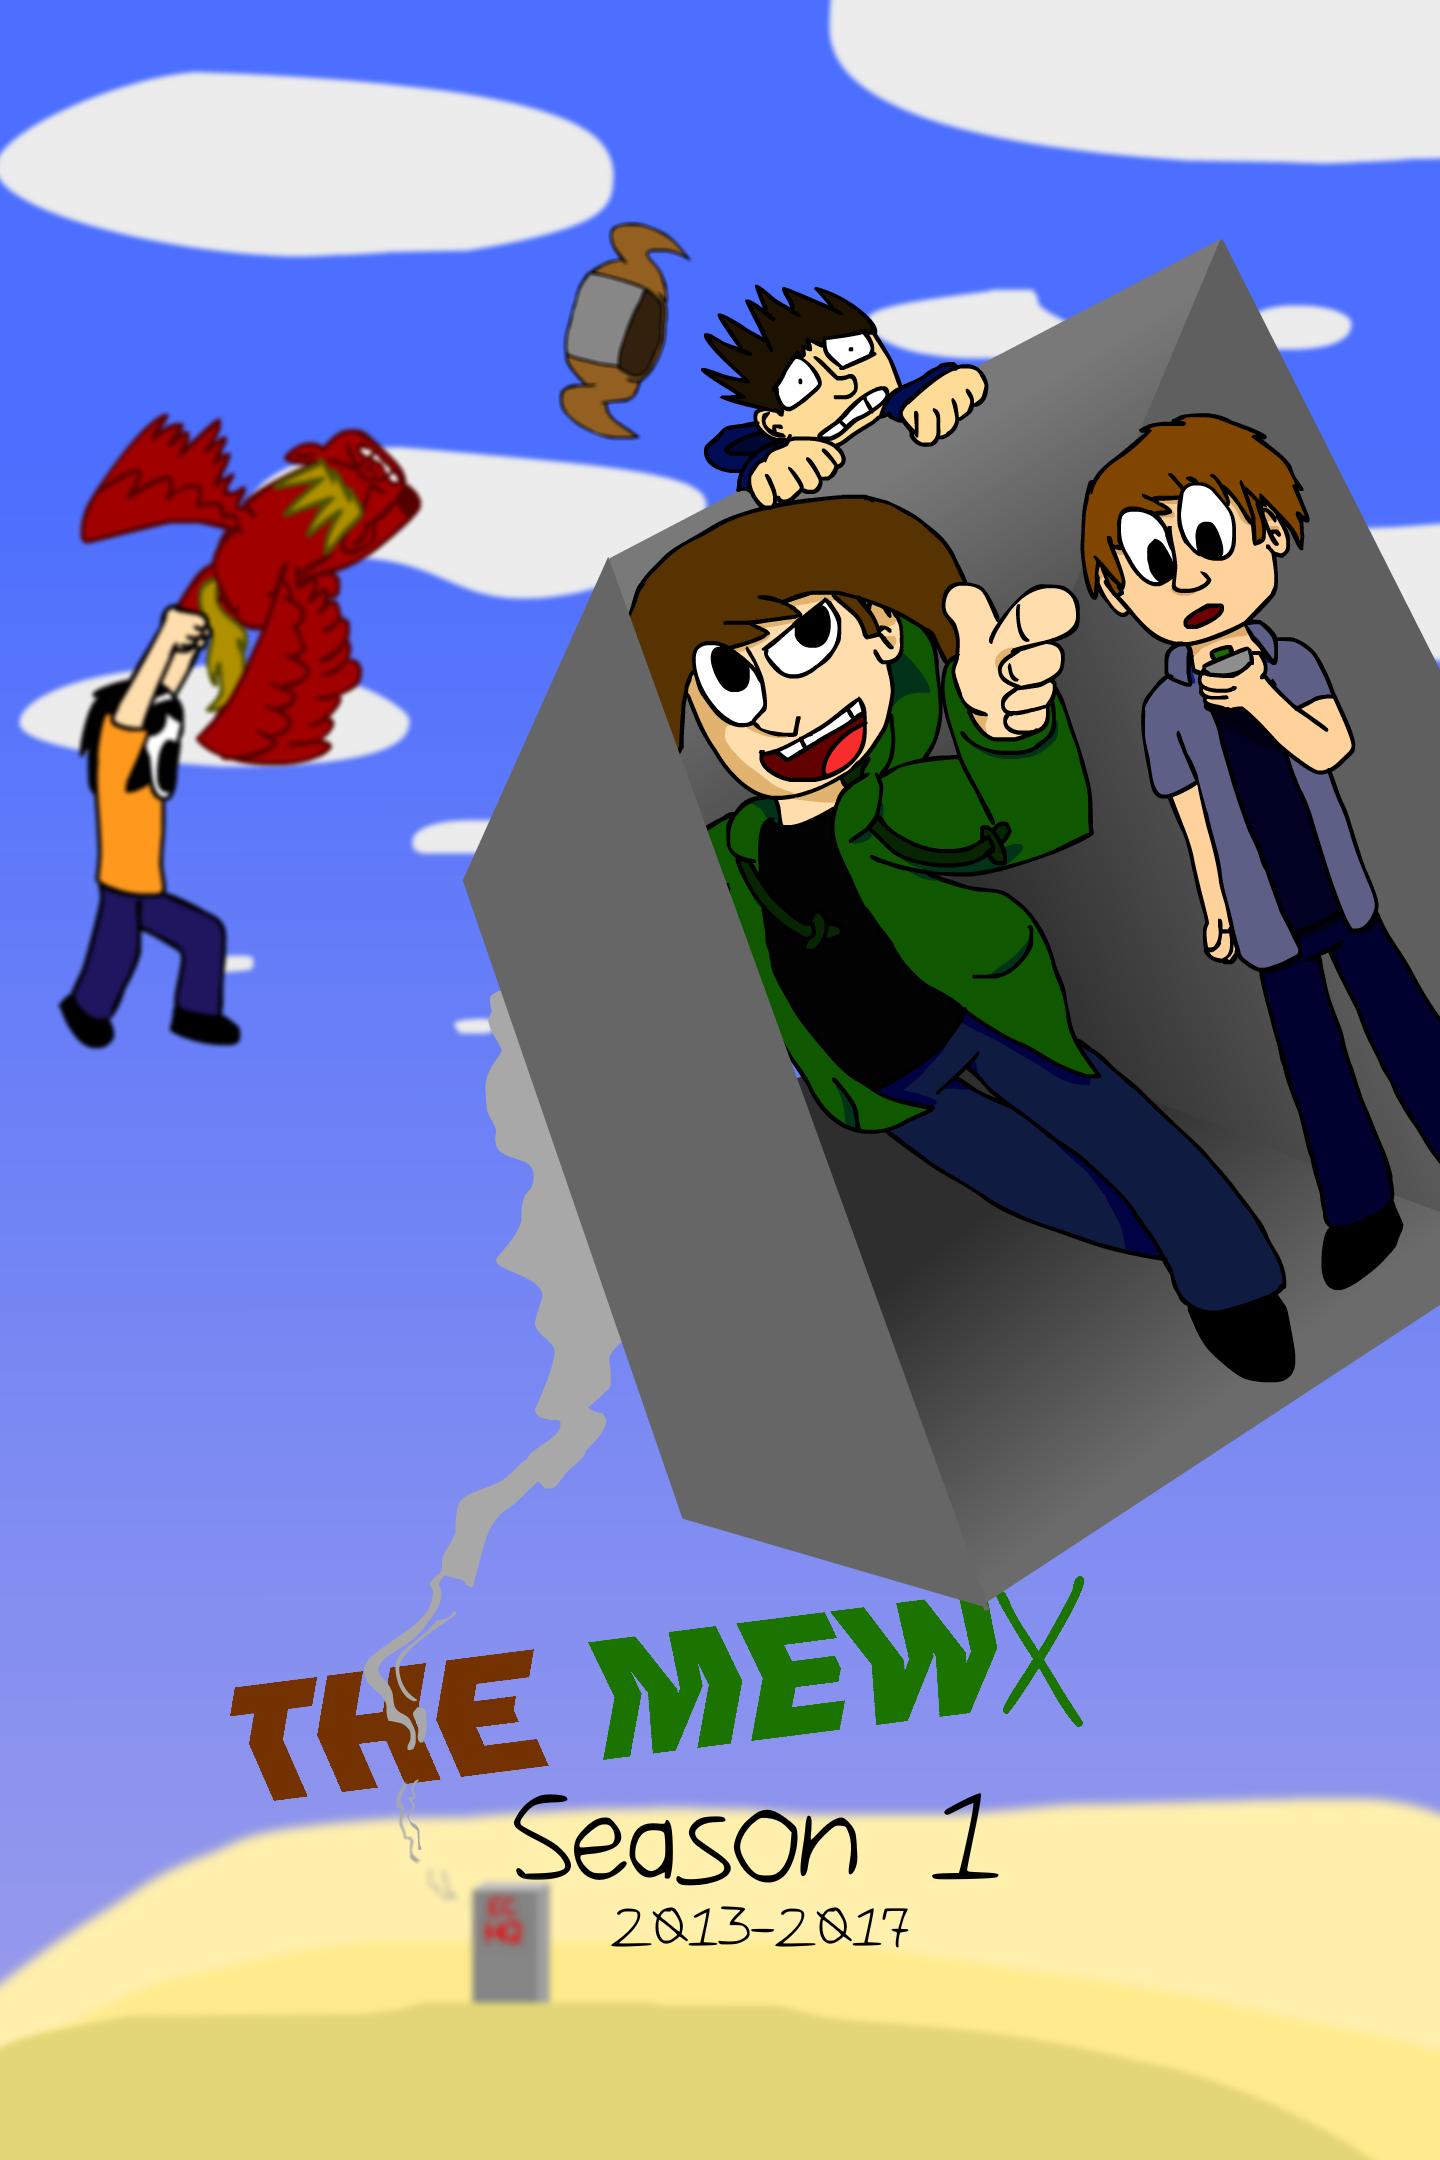 TheMewx Season 1 Poster